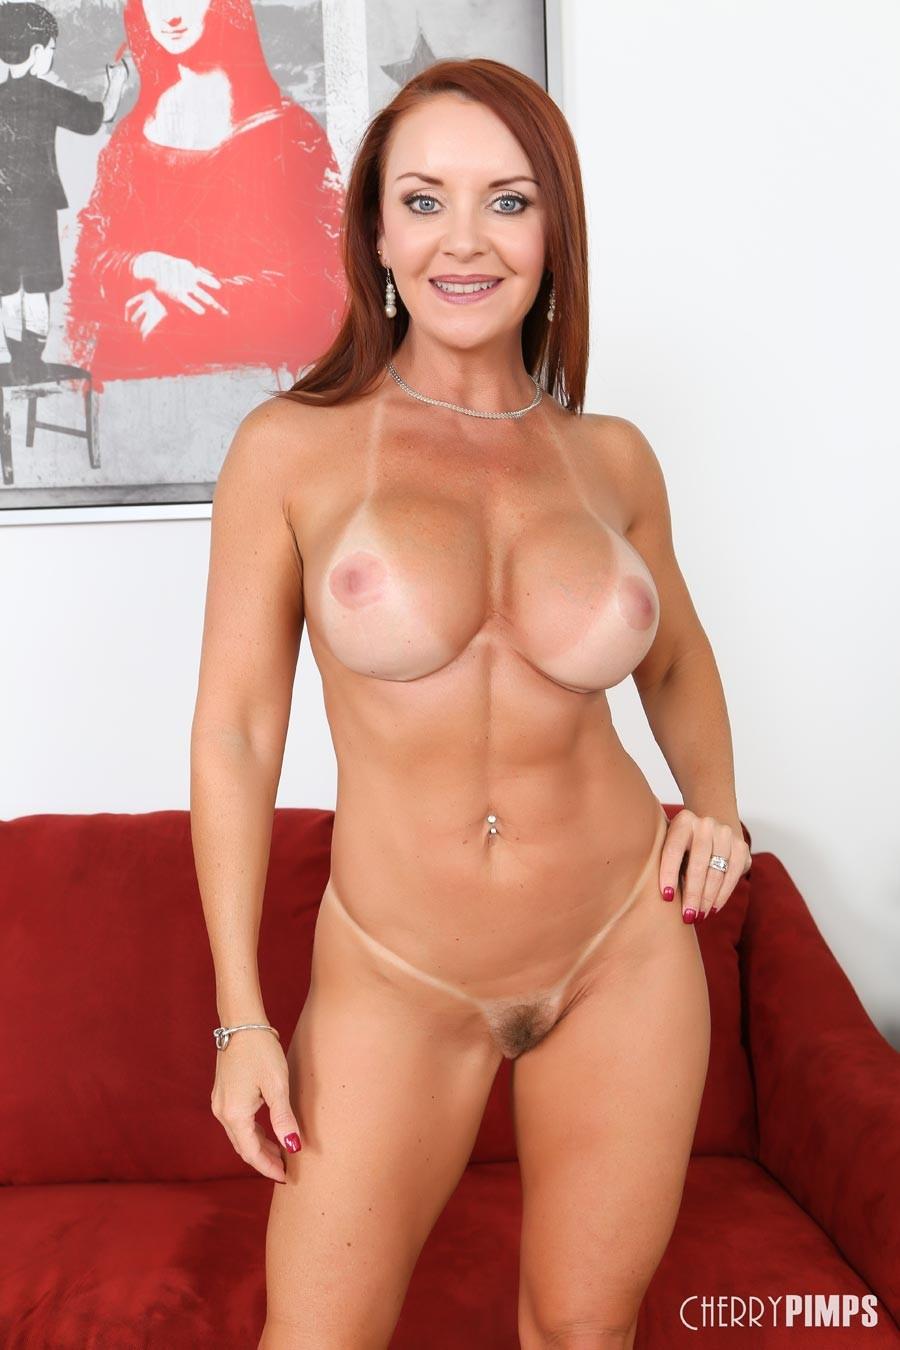 Janet pornstar